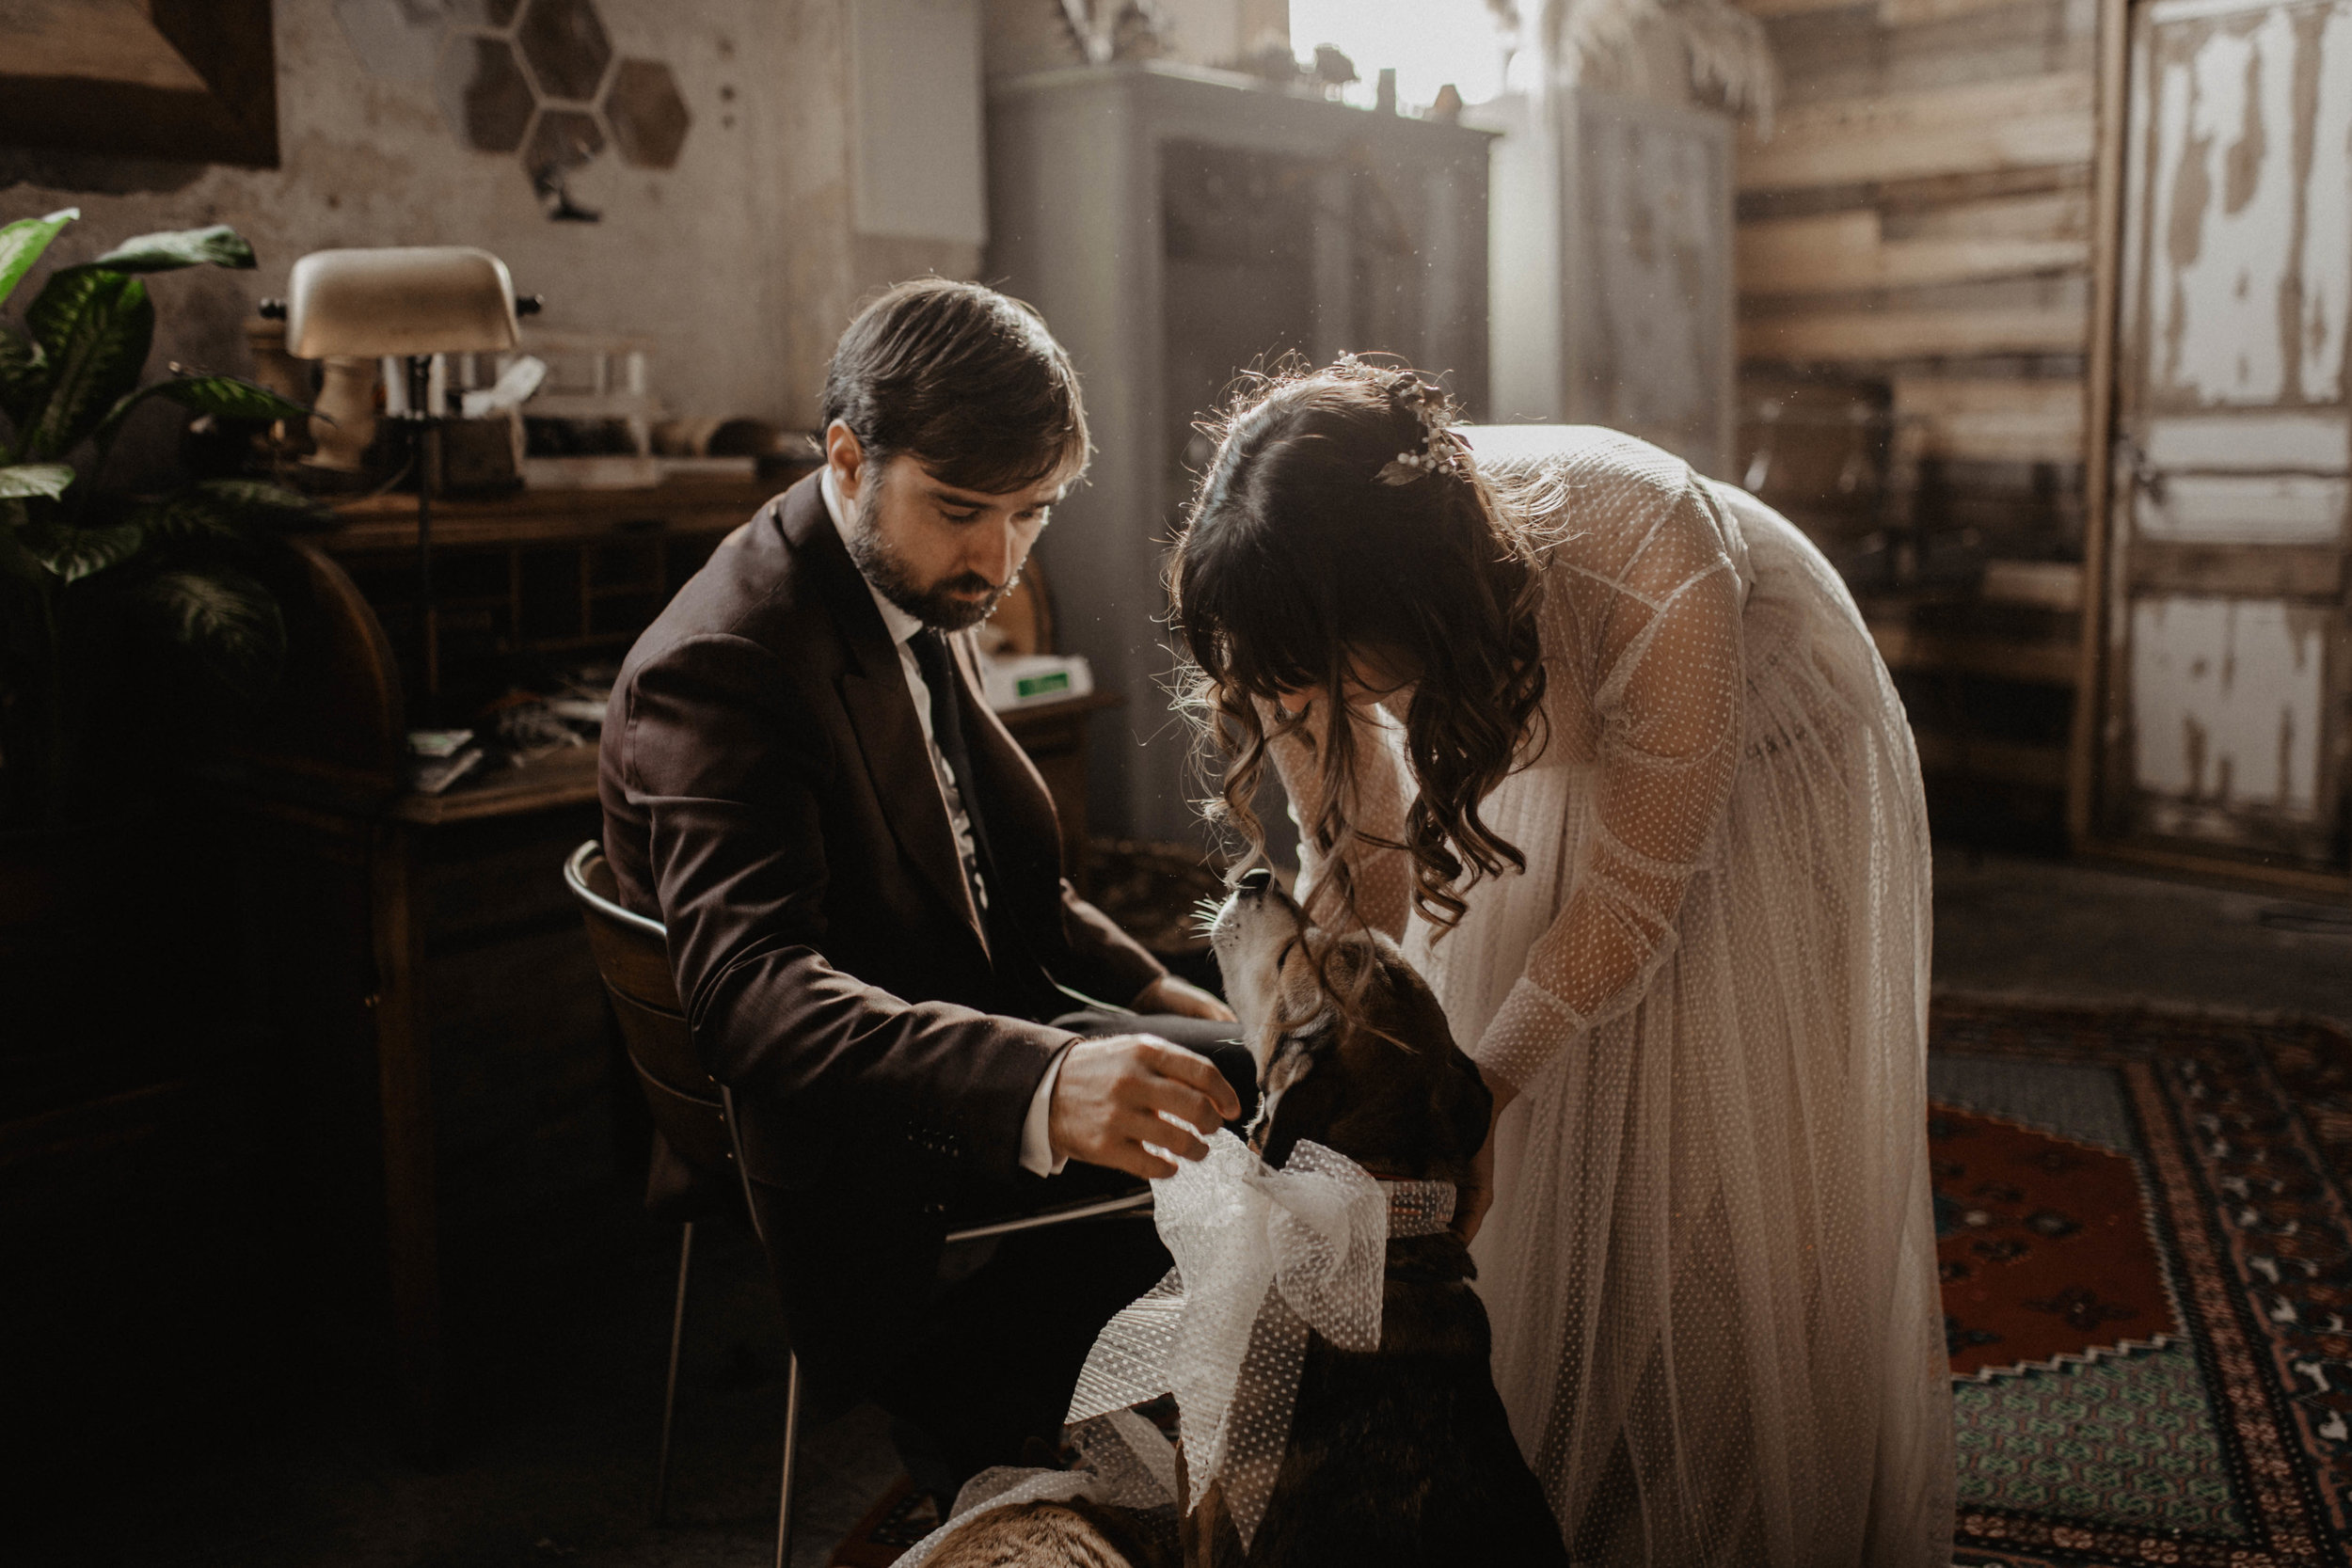 thenortherngirlphotography-photography-weddingphotography-couple-bodasconestilo-bodasenbarcelona-martadavid-203.jpg